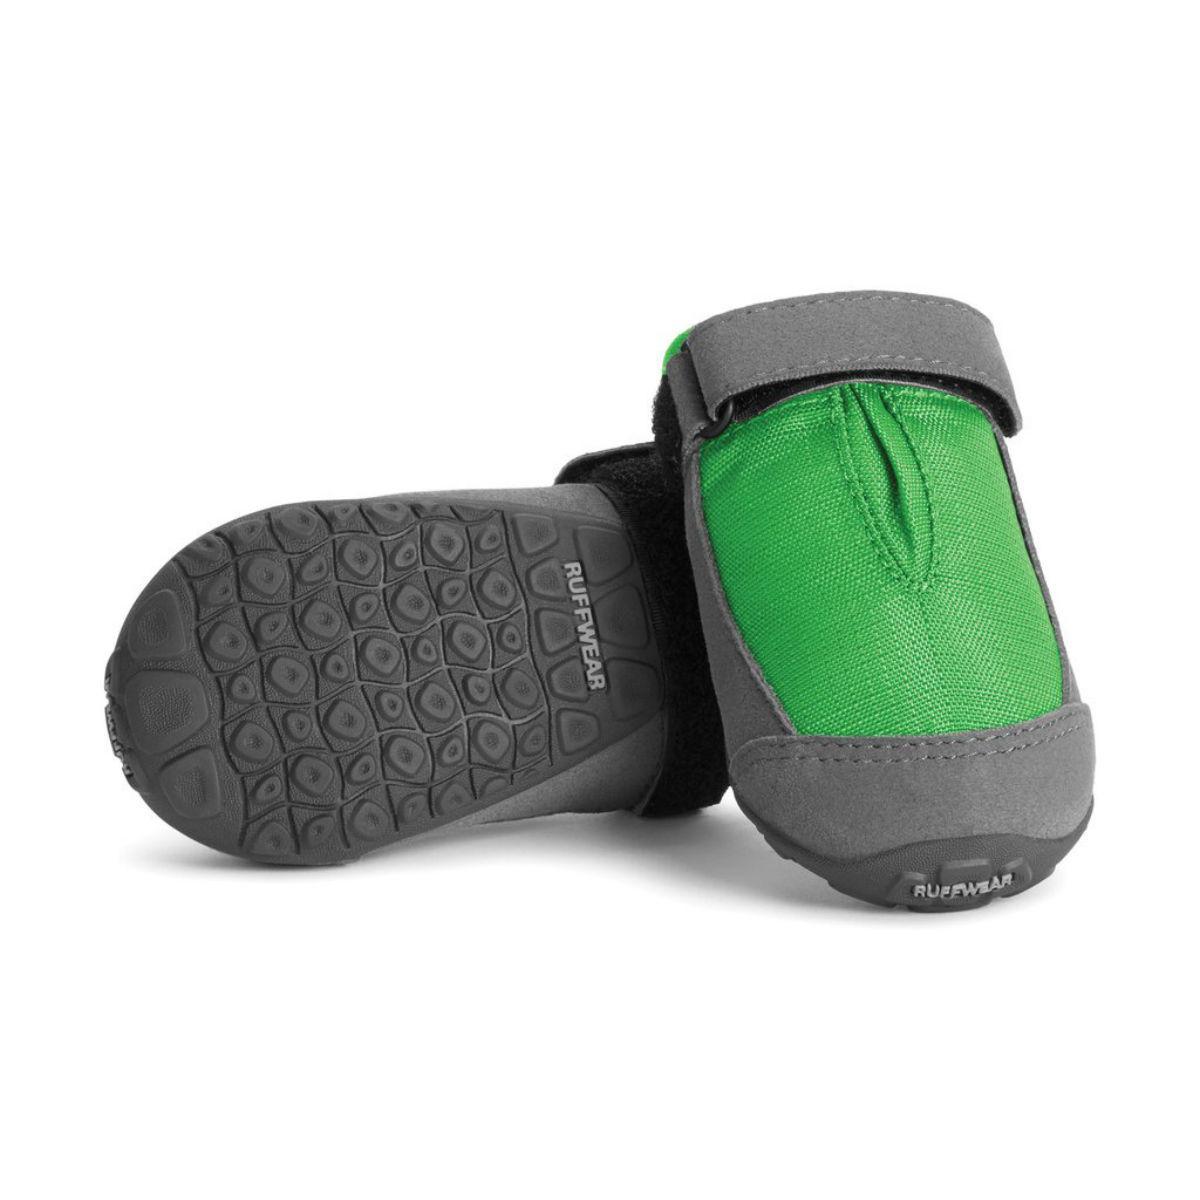 Summit Trex Dog Boots by Ruffwear - 2 Pack - Meadow Green